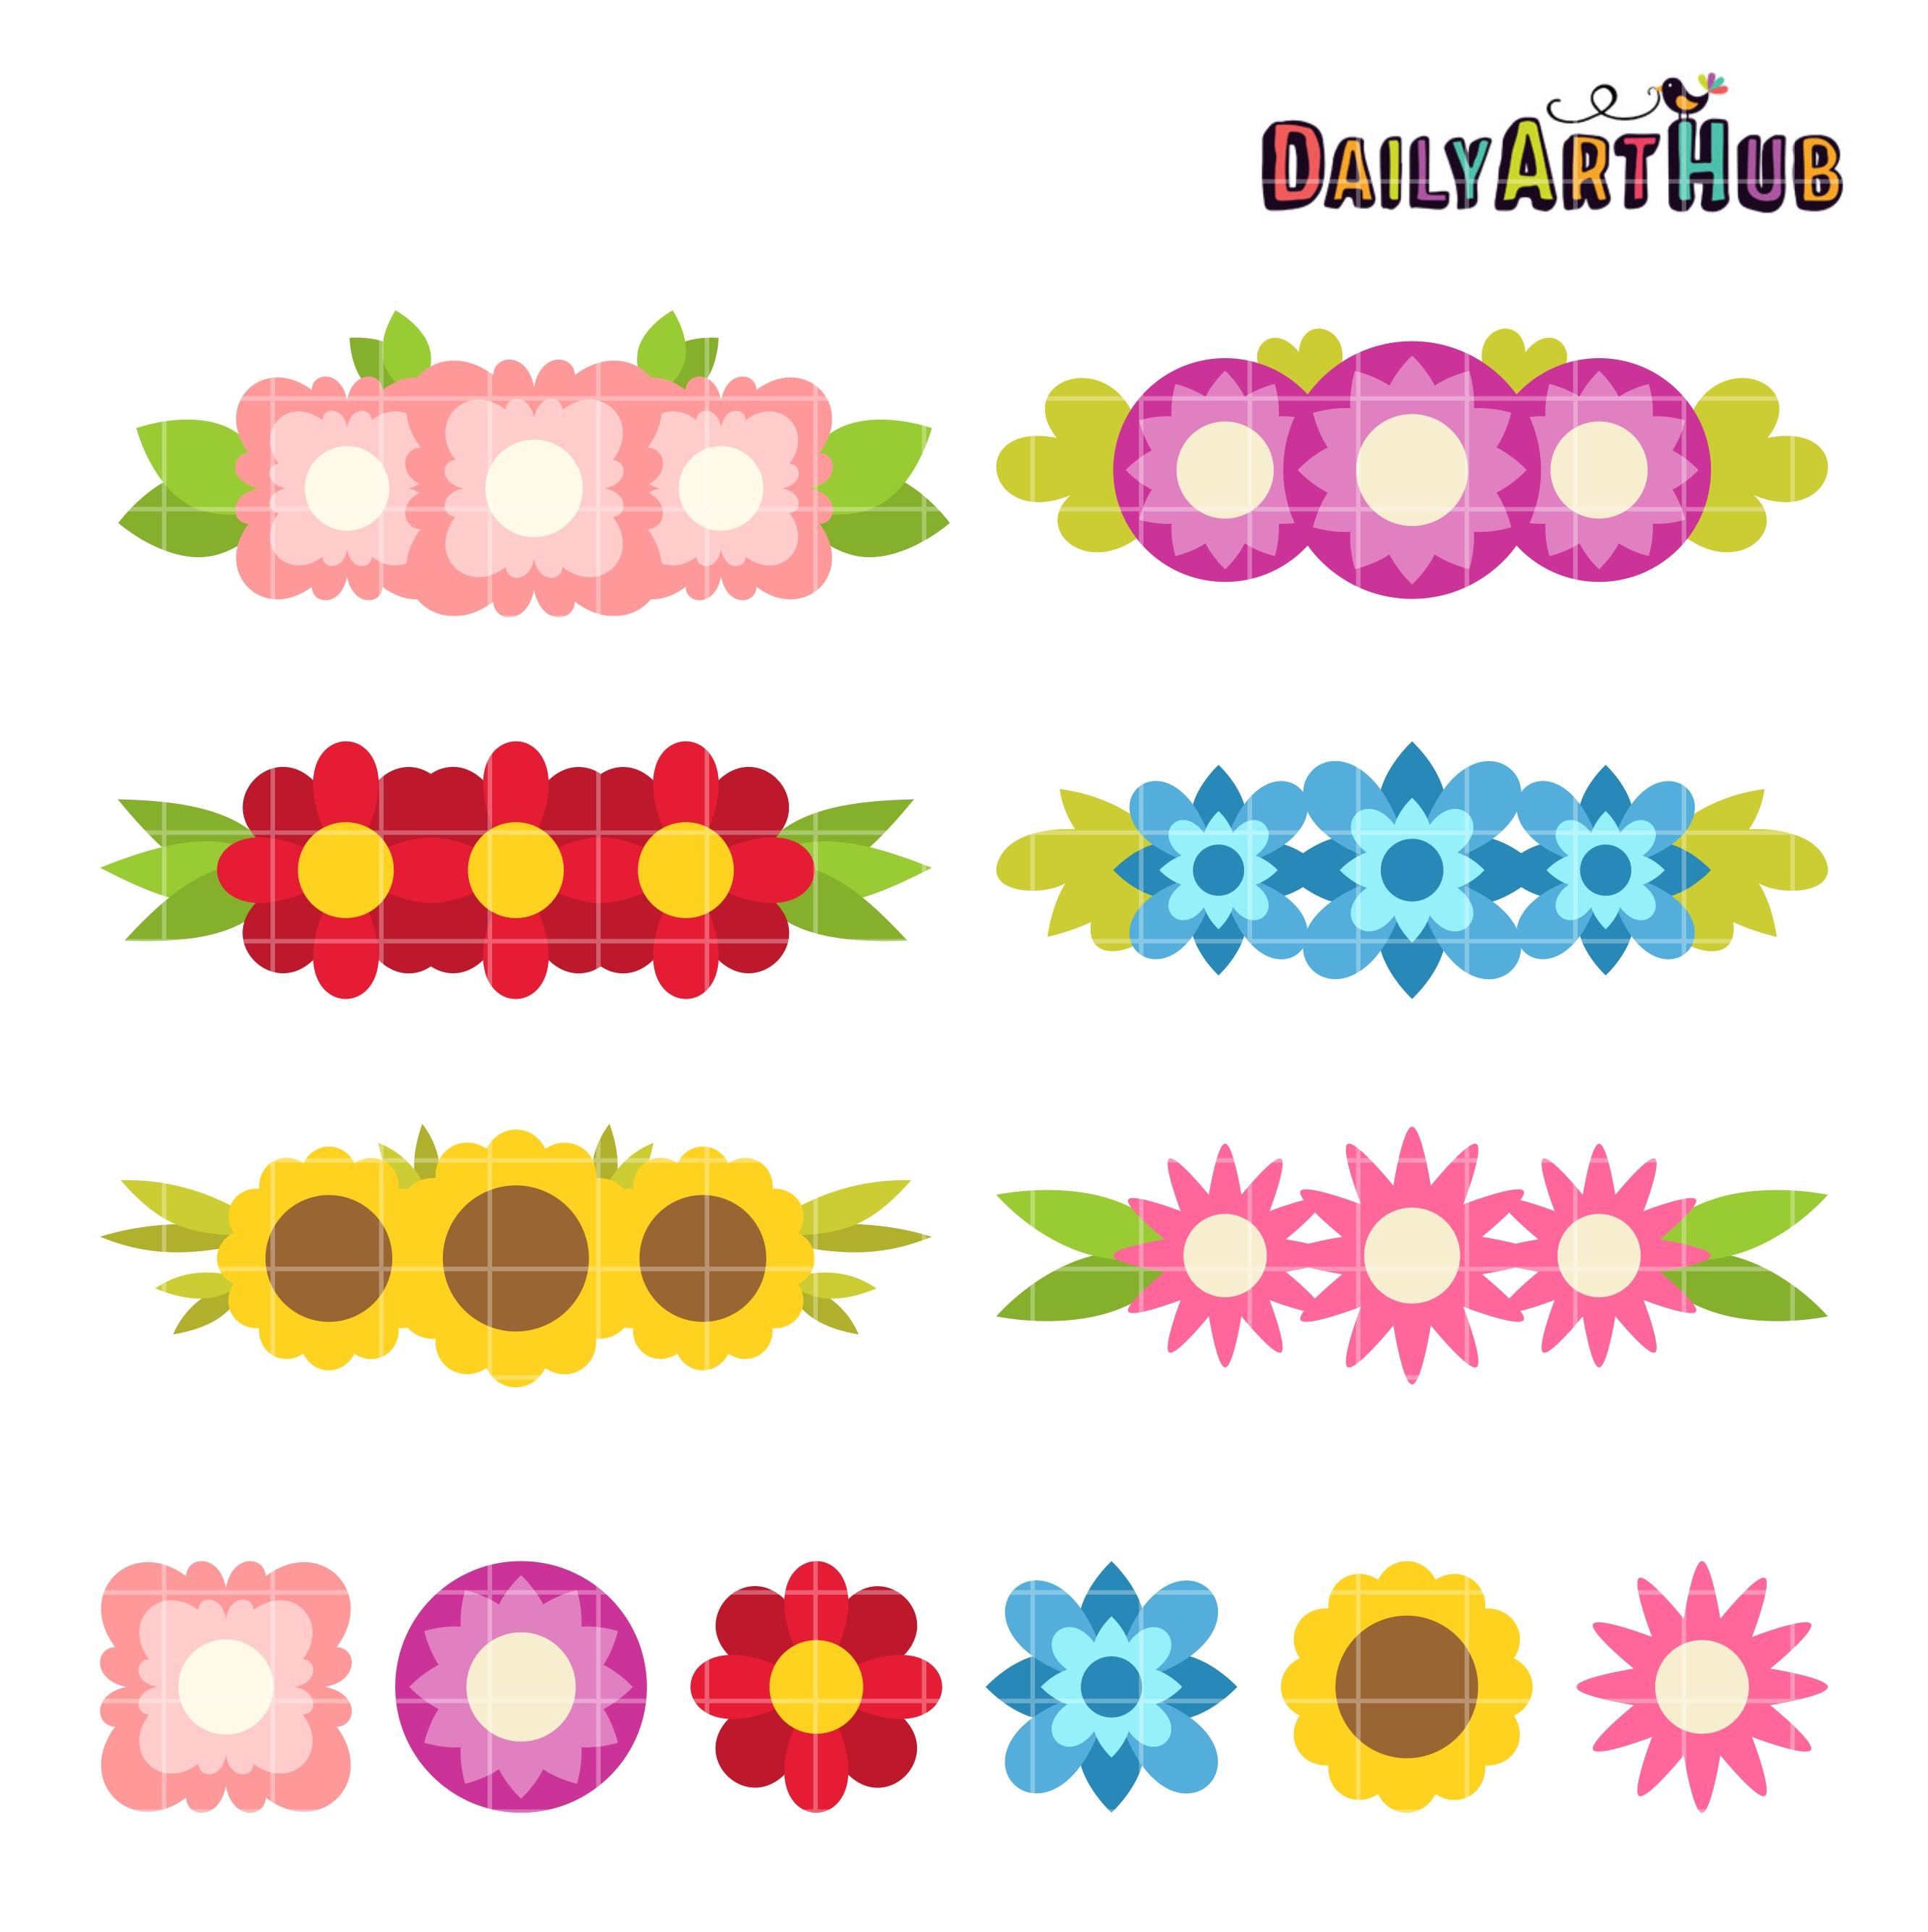 Simple Flower Crowns Clip Art Set – Daily Art Hub – Free ...